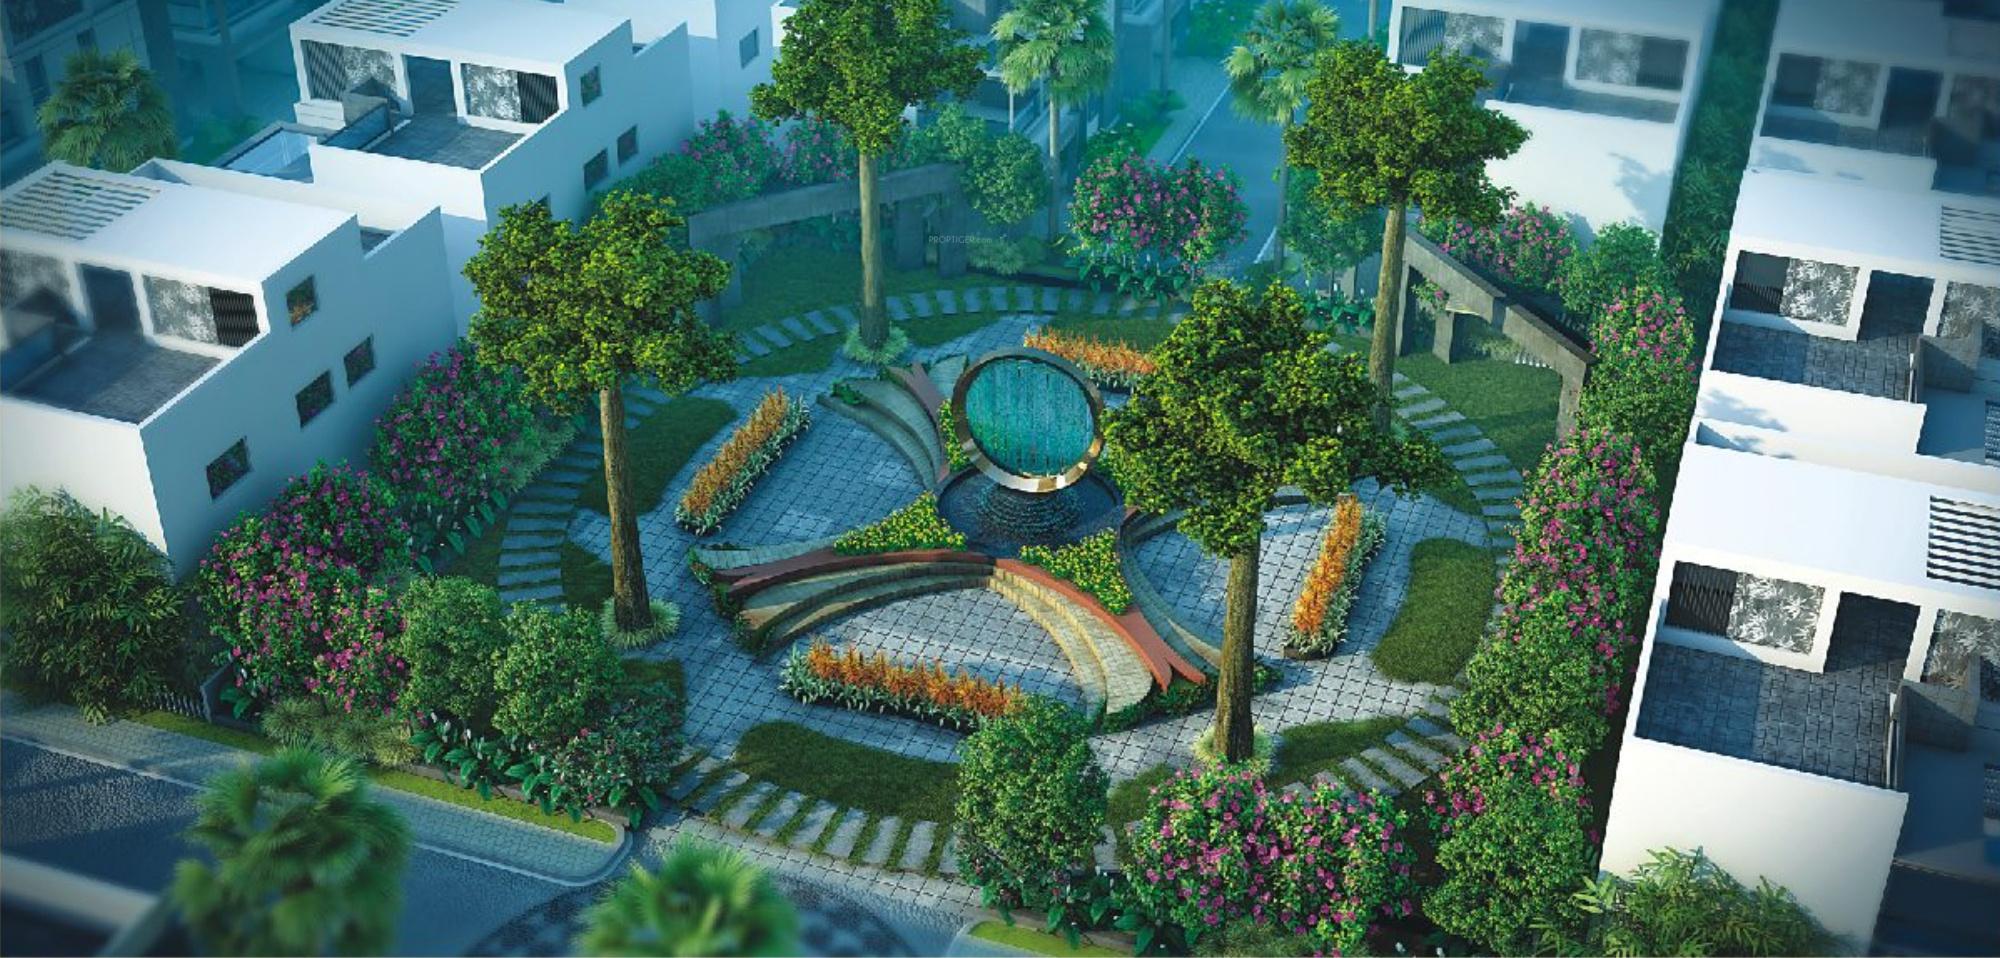 my mypi green castle villasmy place in kompally, hyderabad